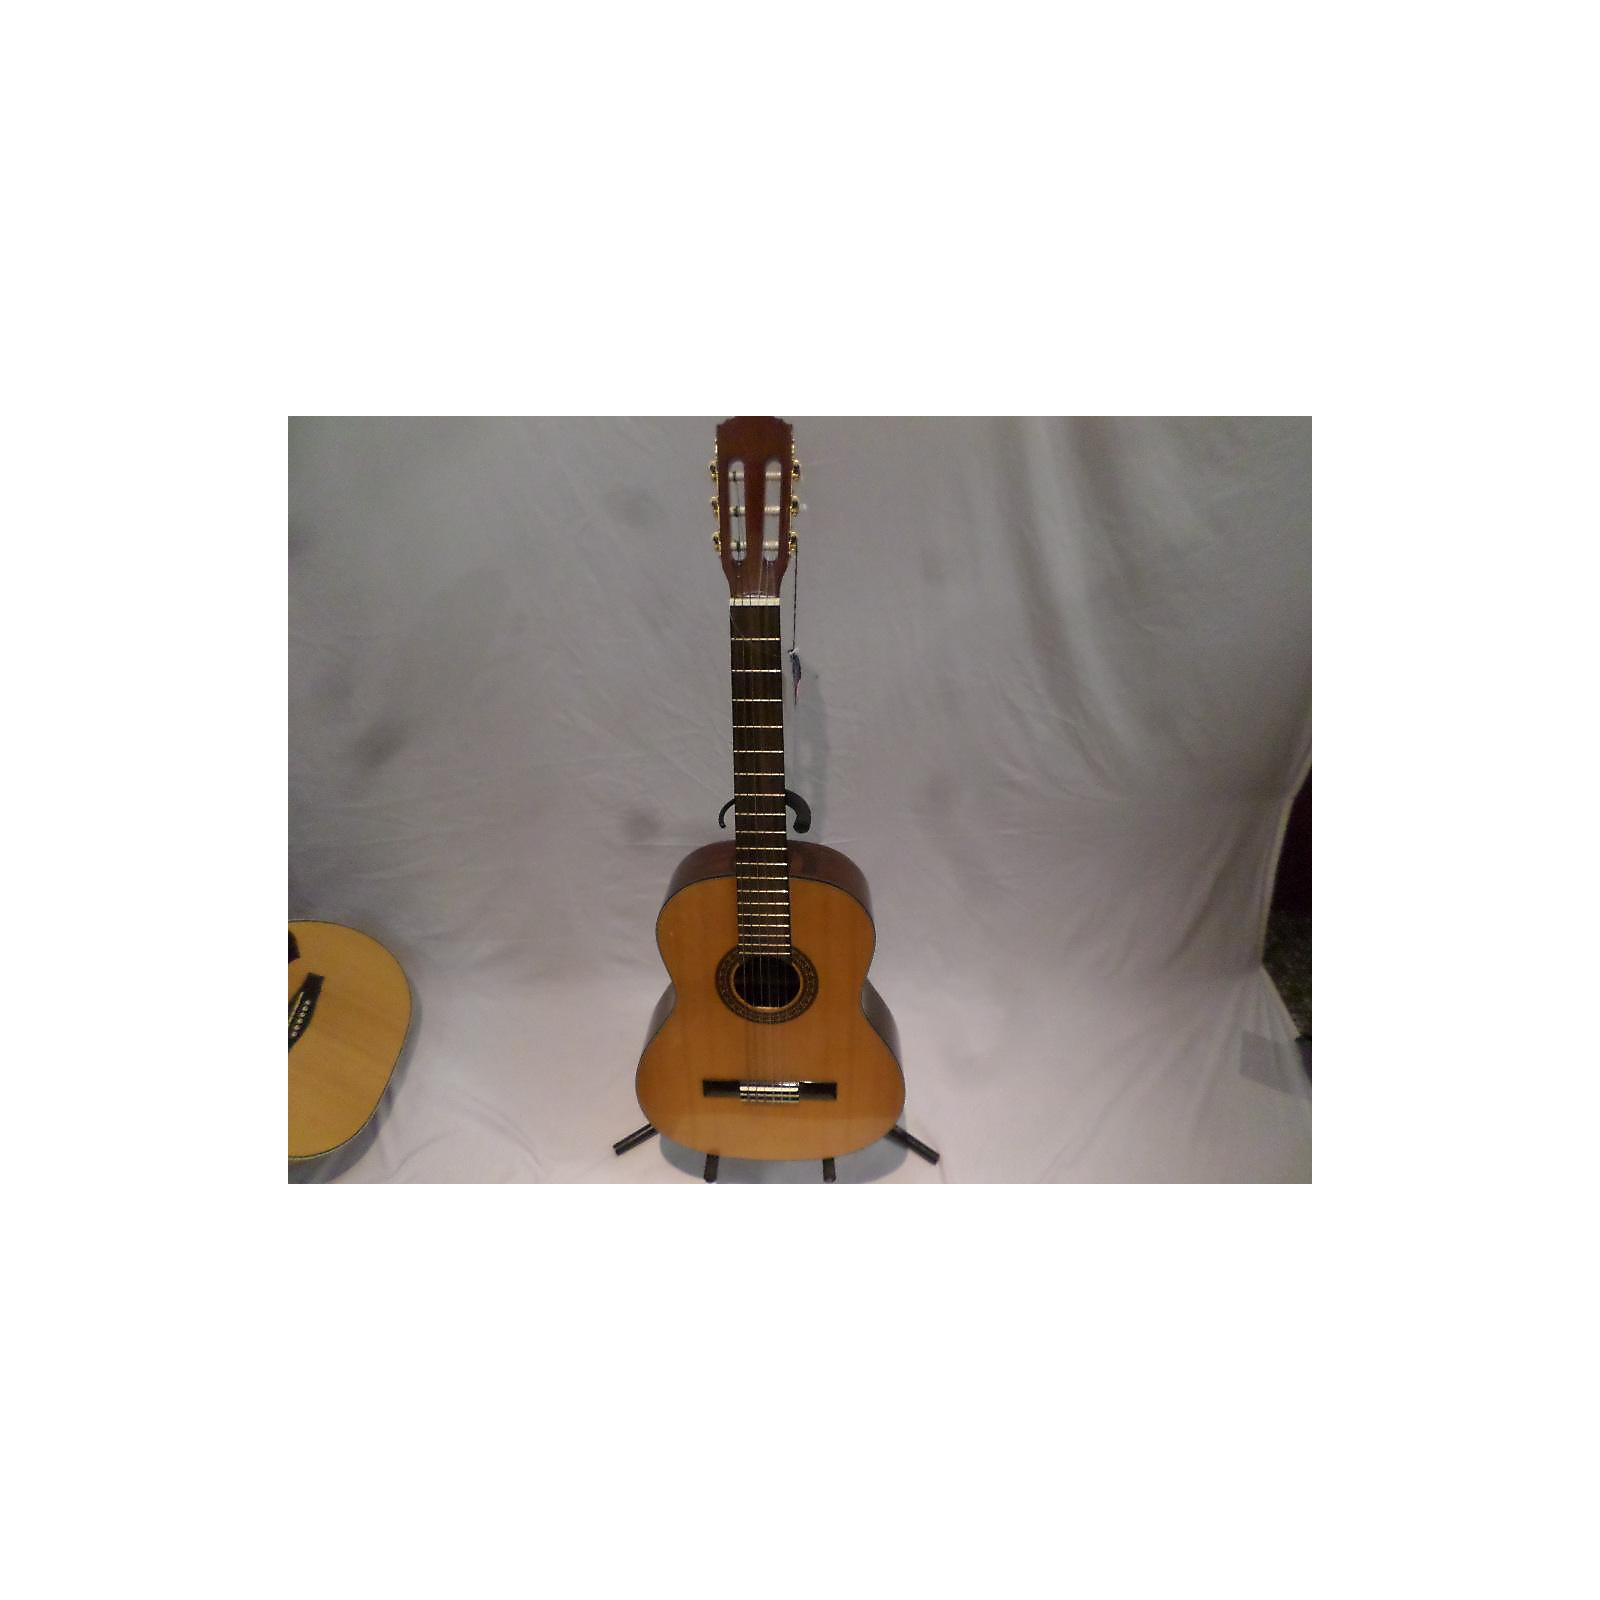 Dean Espana Modelo CGP Classical Acoustic Guitar